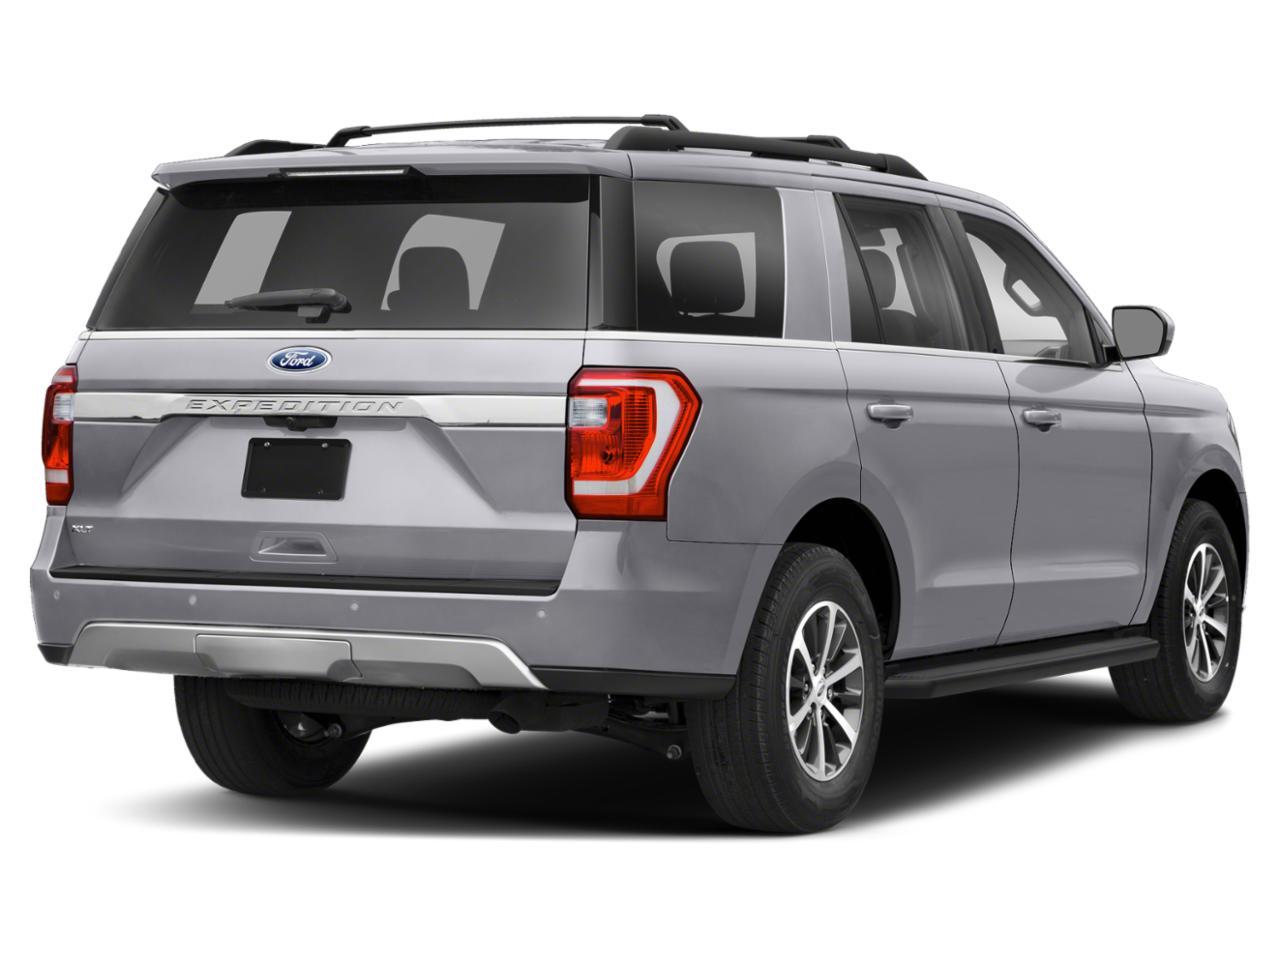 2020 Ford Expedition XLT 4D Sport Utility Slide